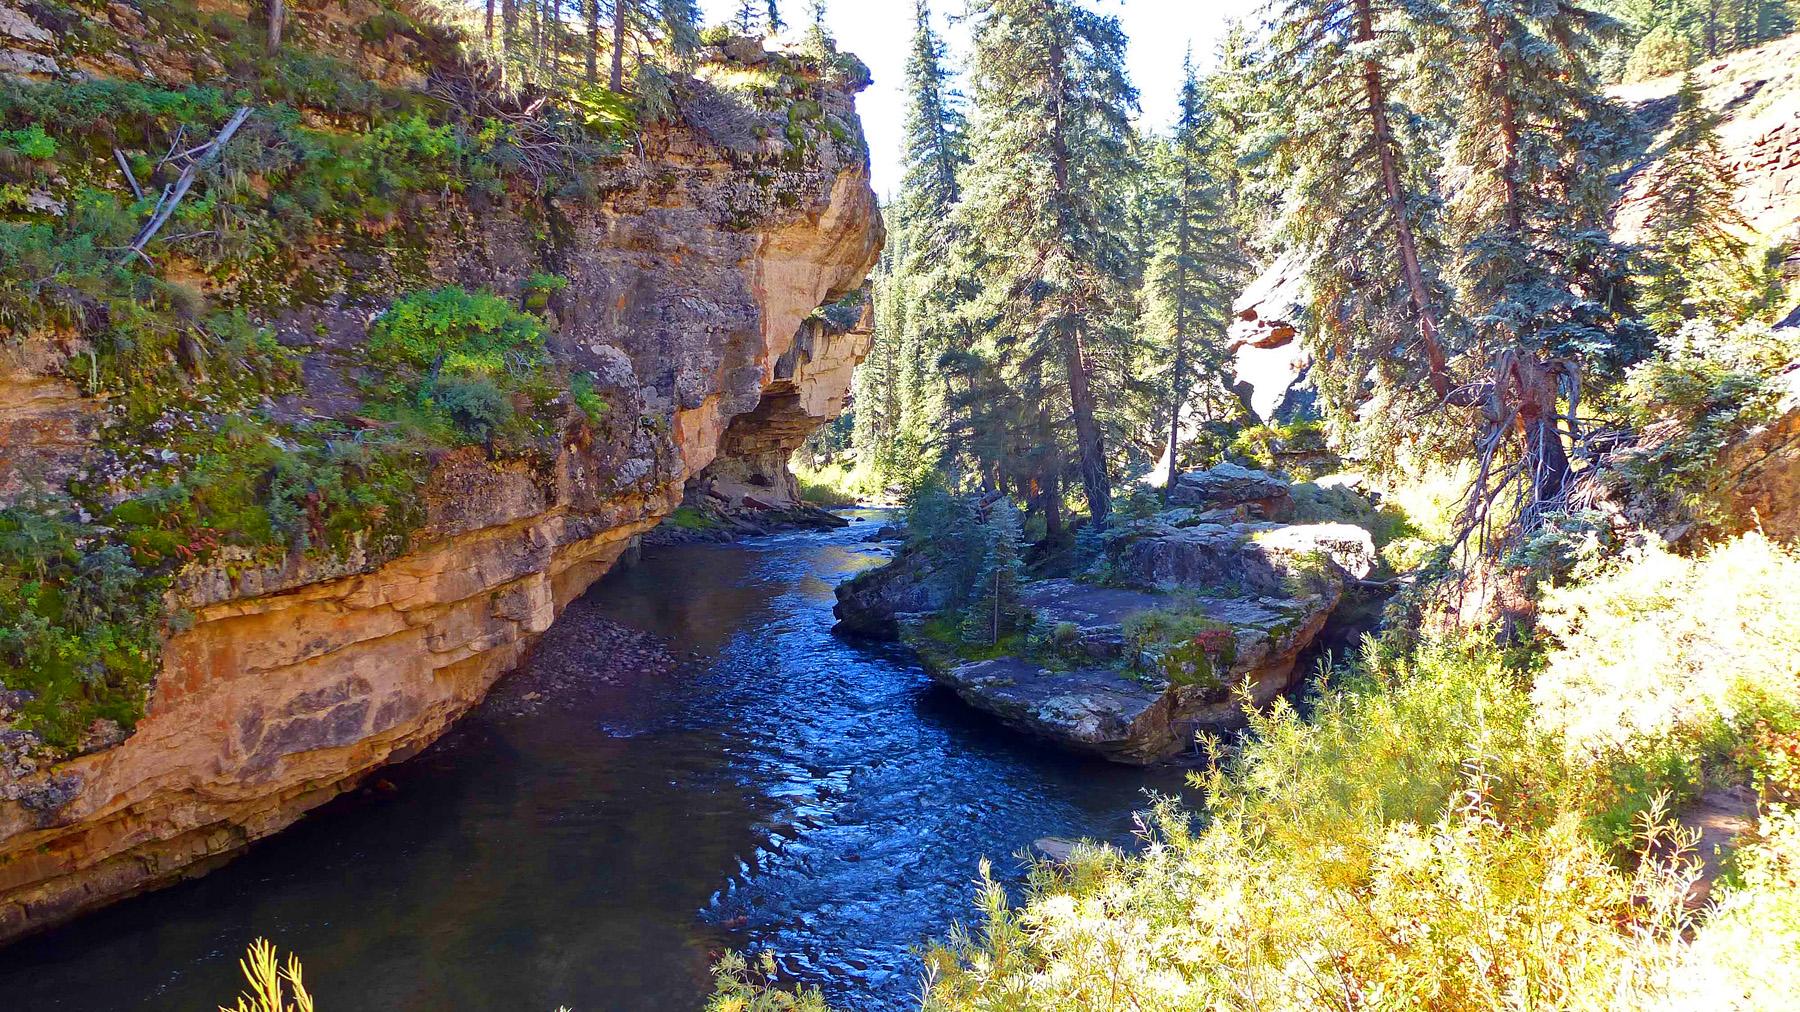 Piedra-River-Trail-4.jpg